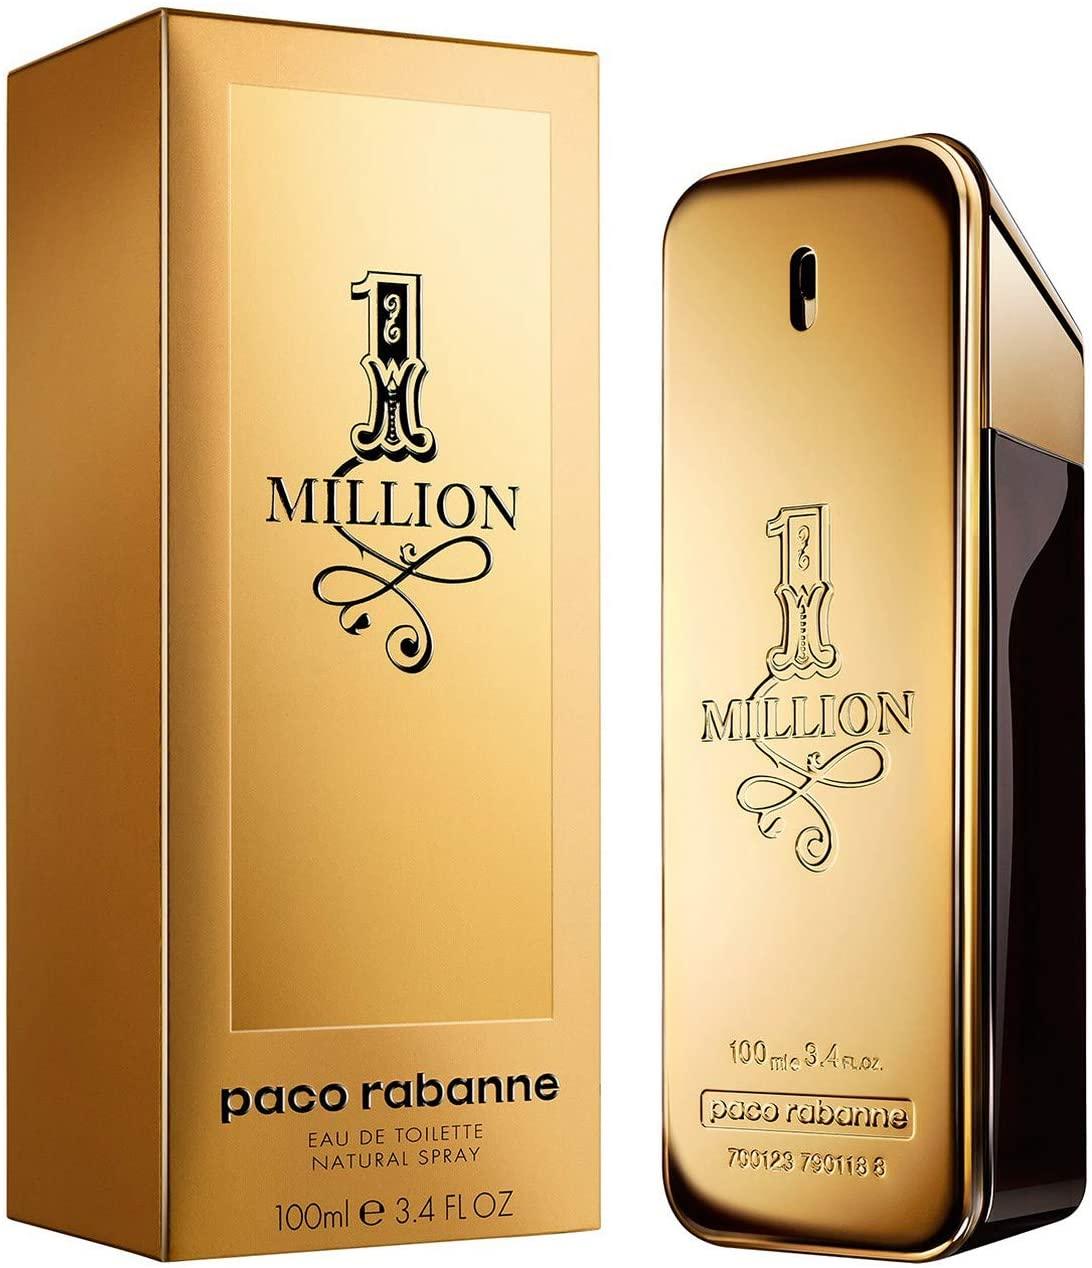 One Million – Paco Rabanne